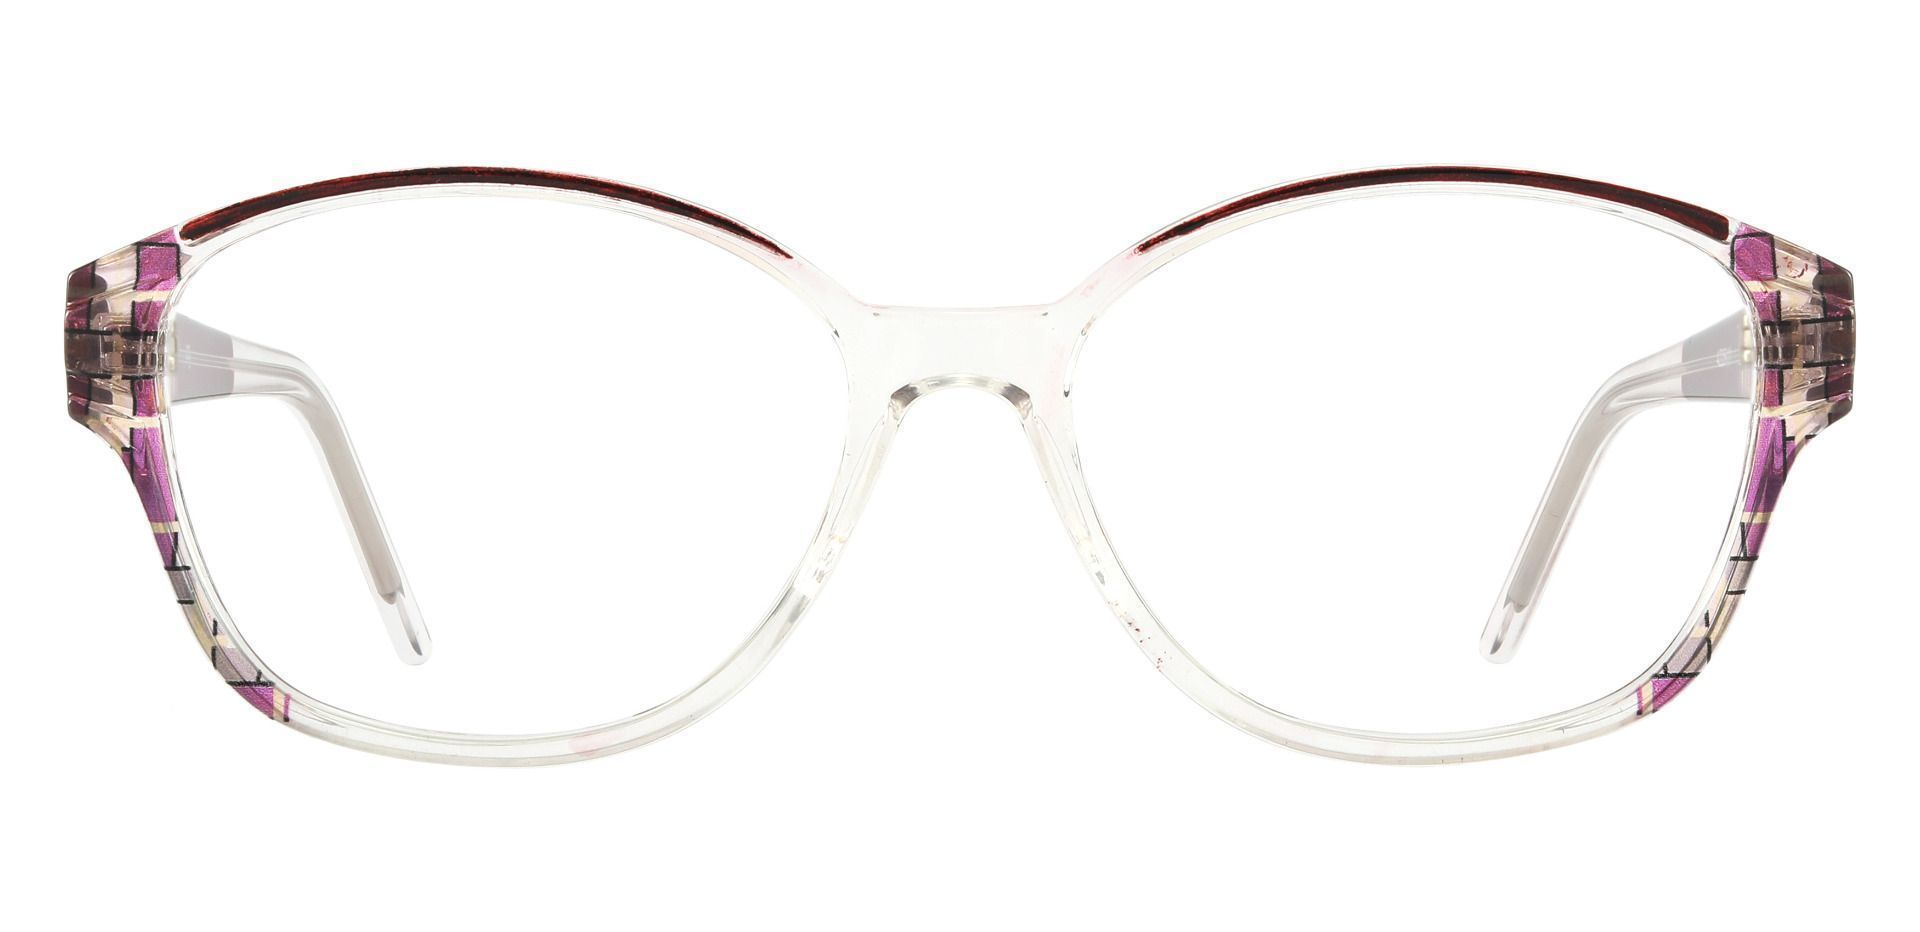 Moira Oval Prescription Glasses - Pink